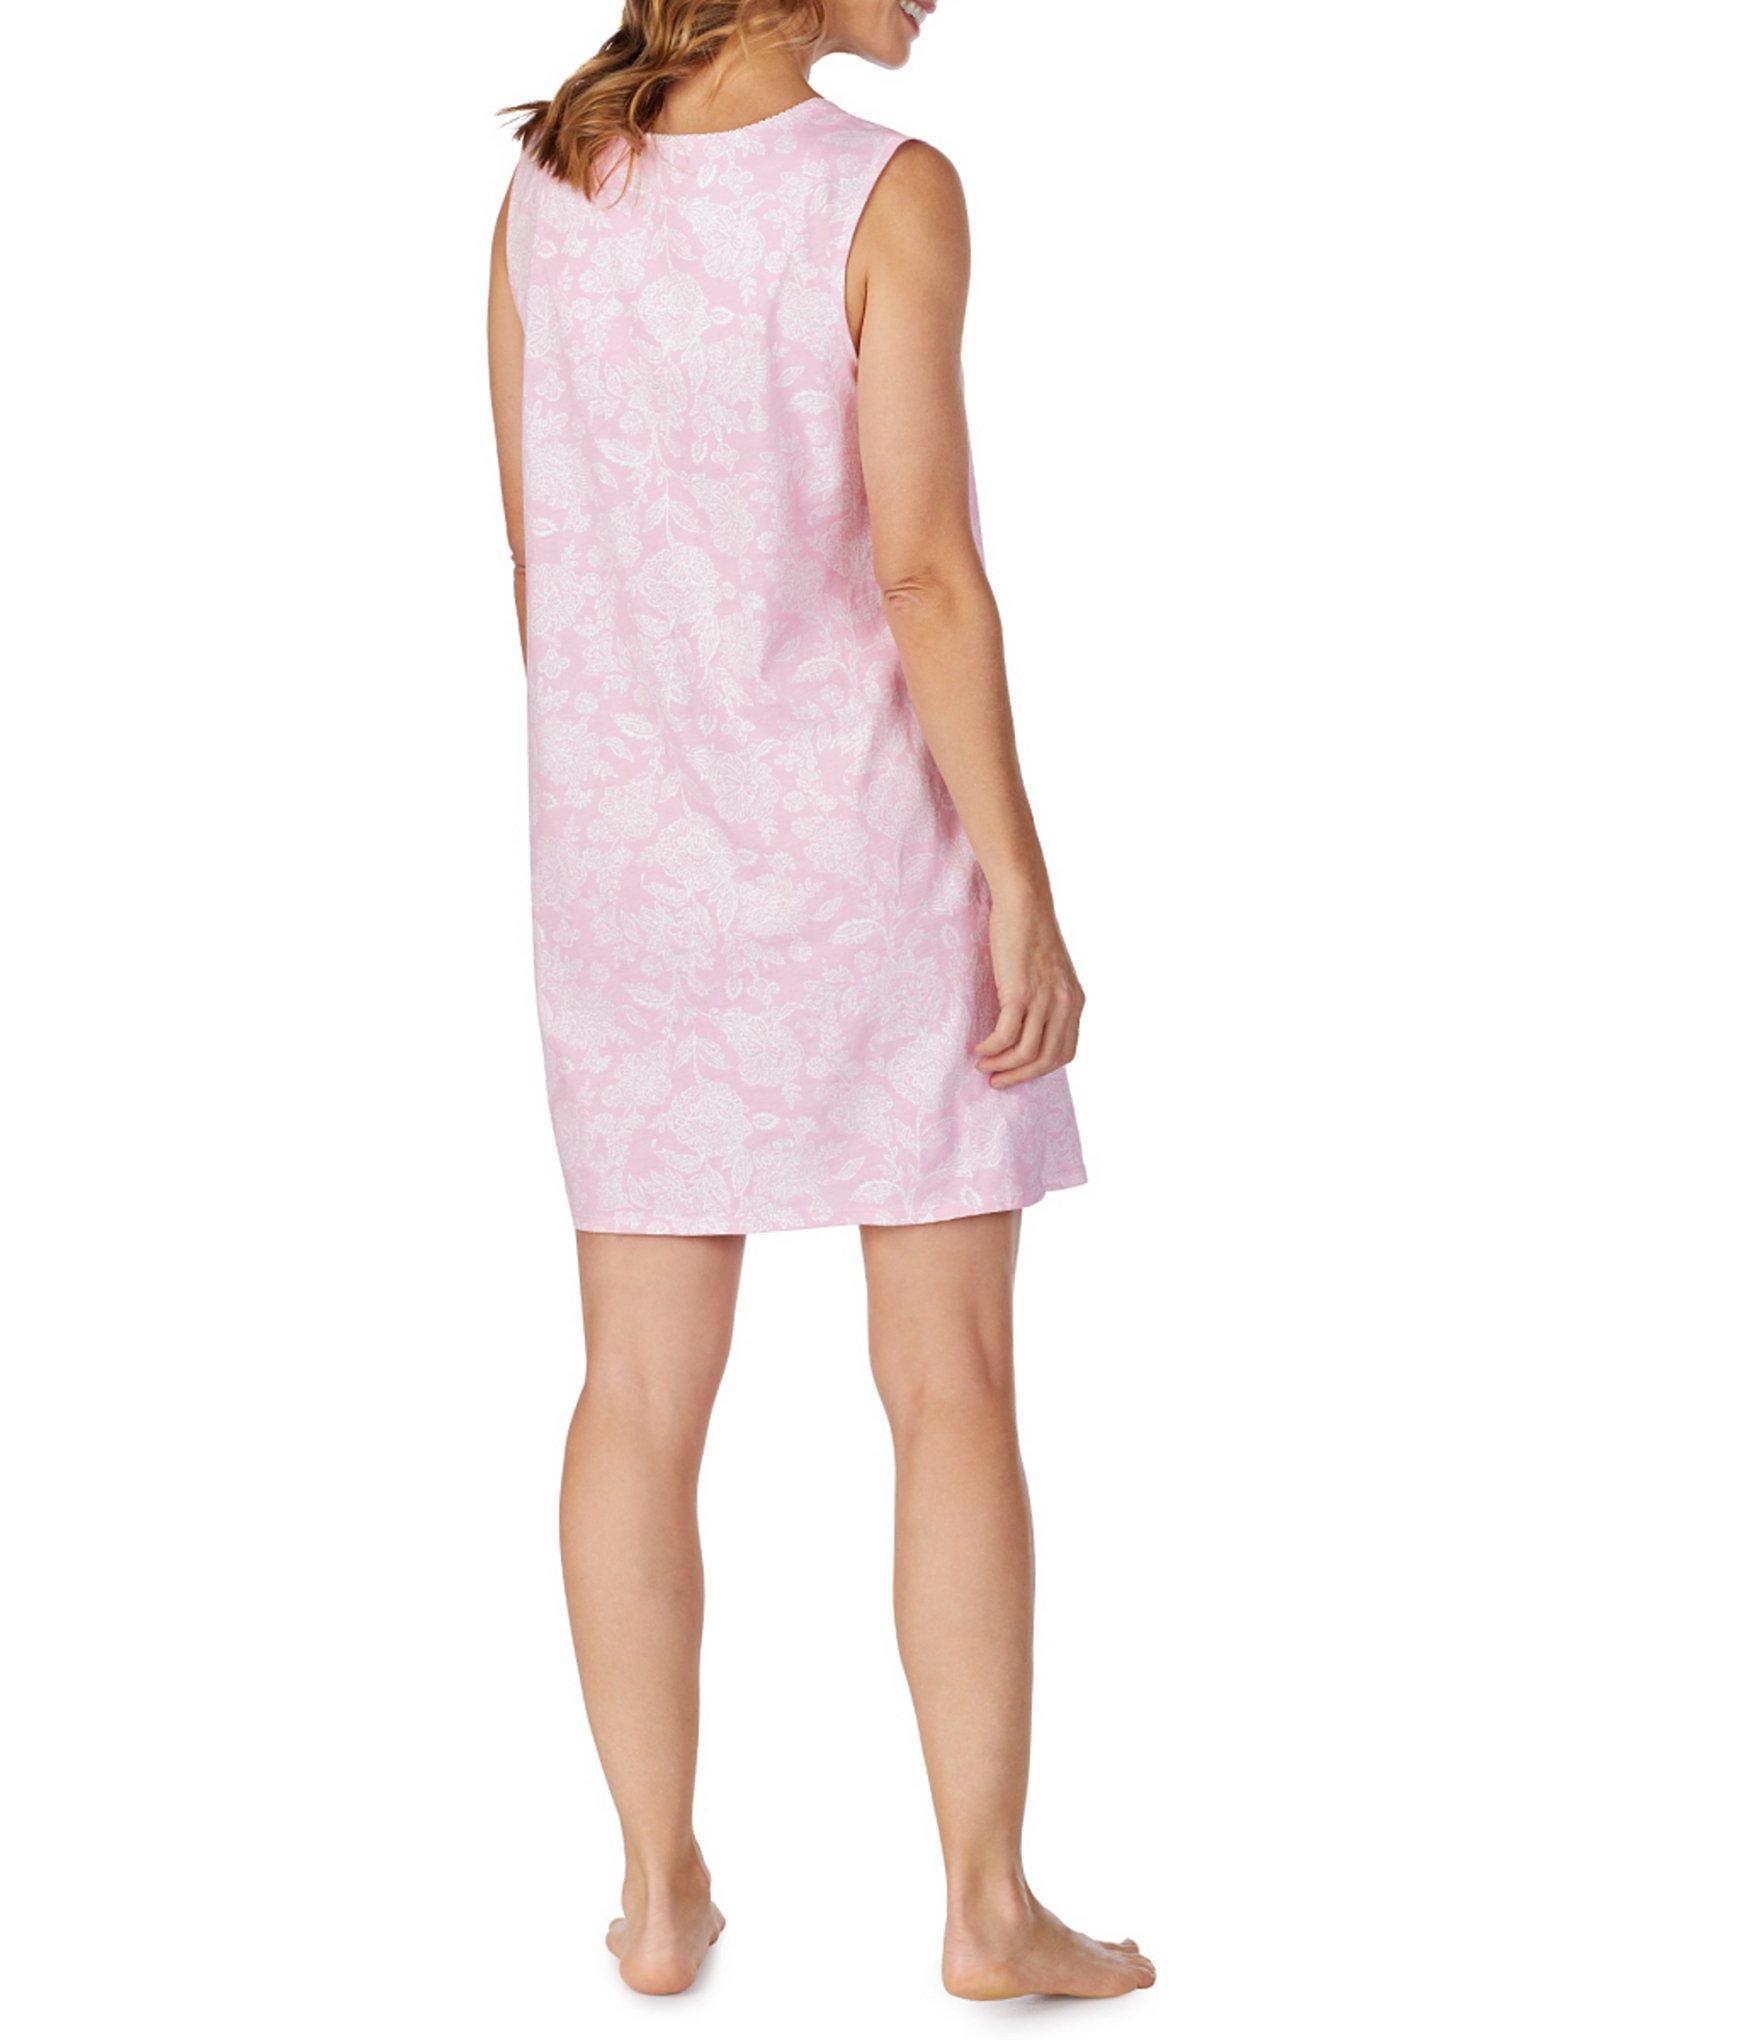 177d6b6d27 Carole Hochman - Pink Damask-printed Jersey Knit Short Gown - Lyst. View  fullscreen